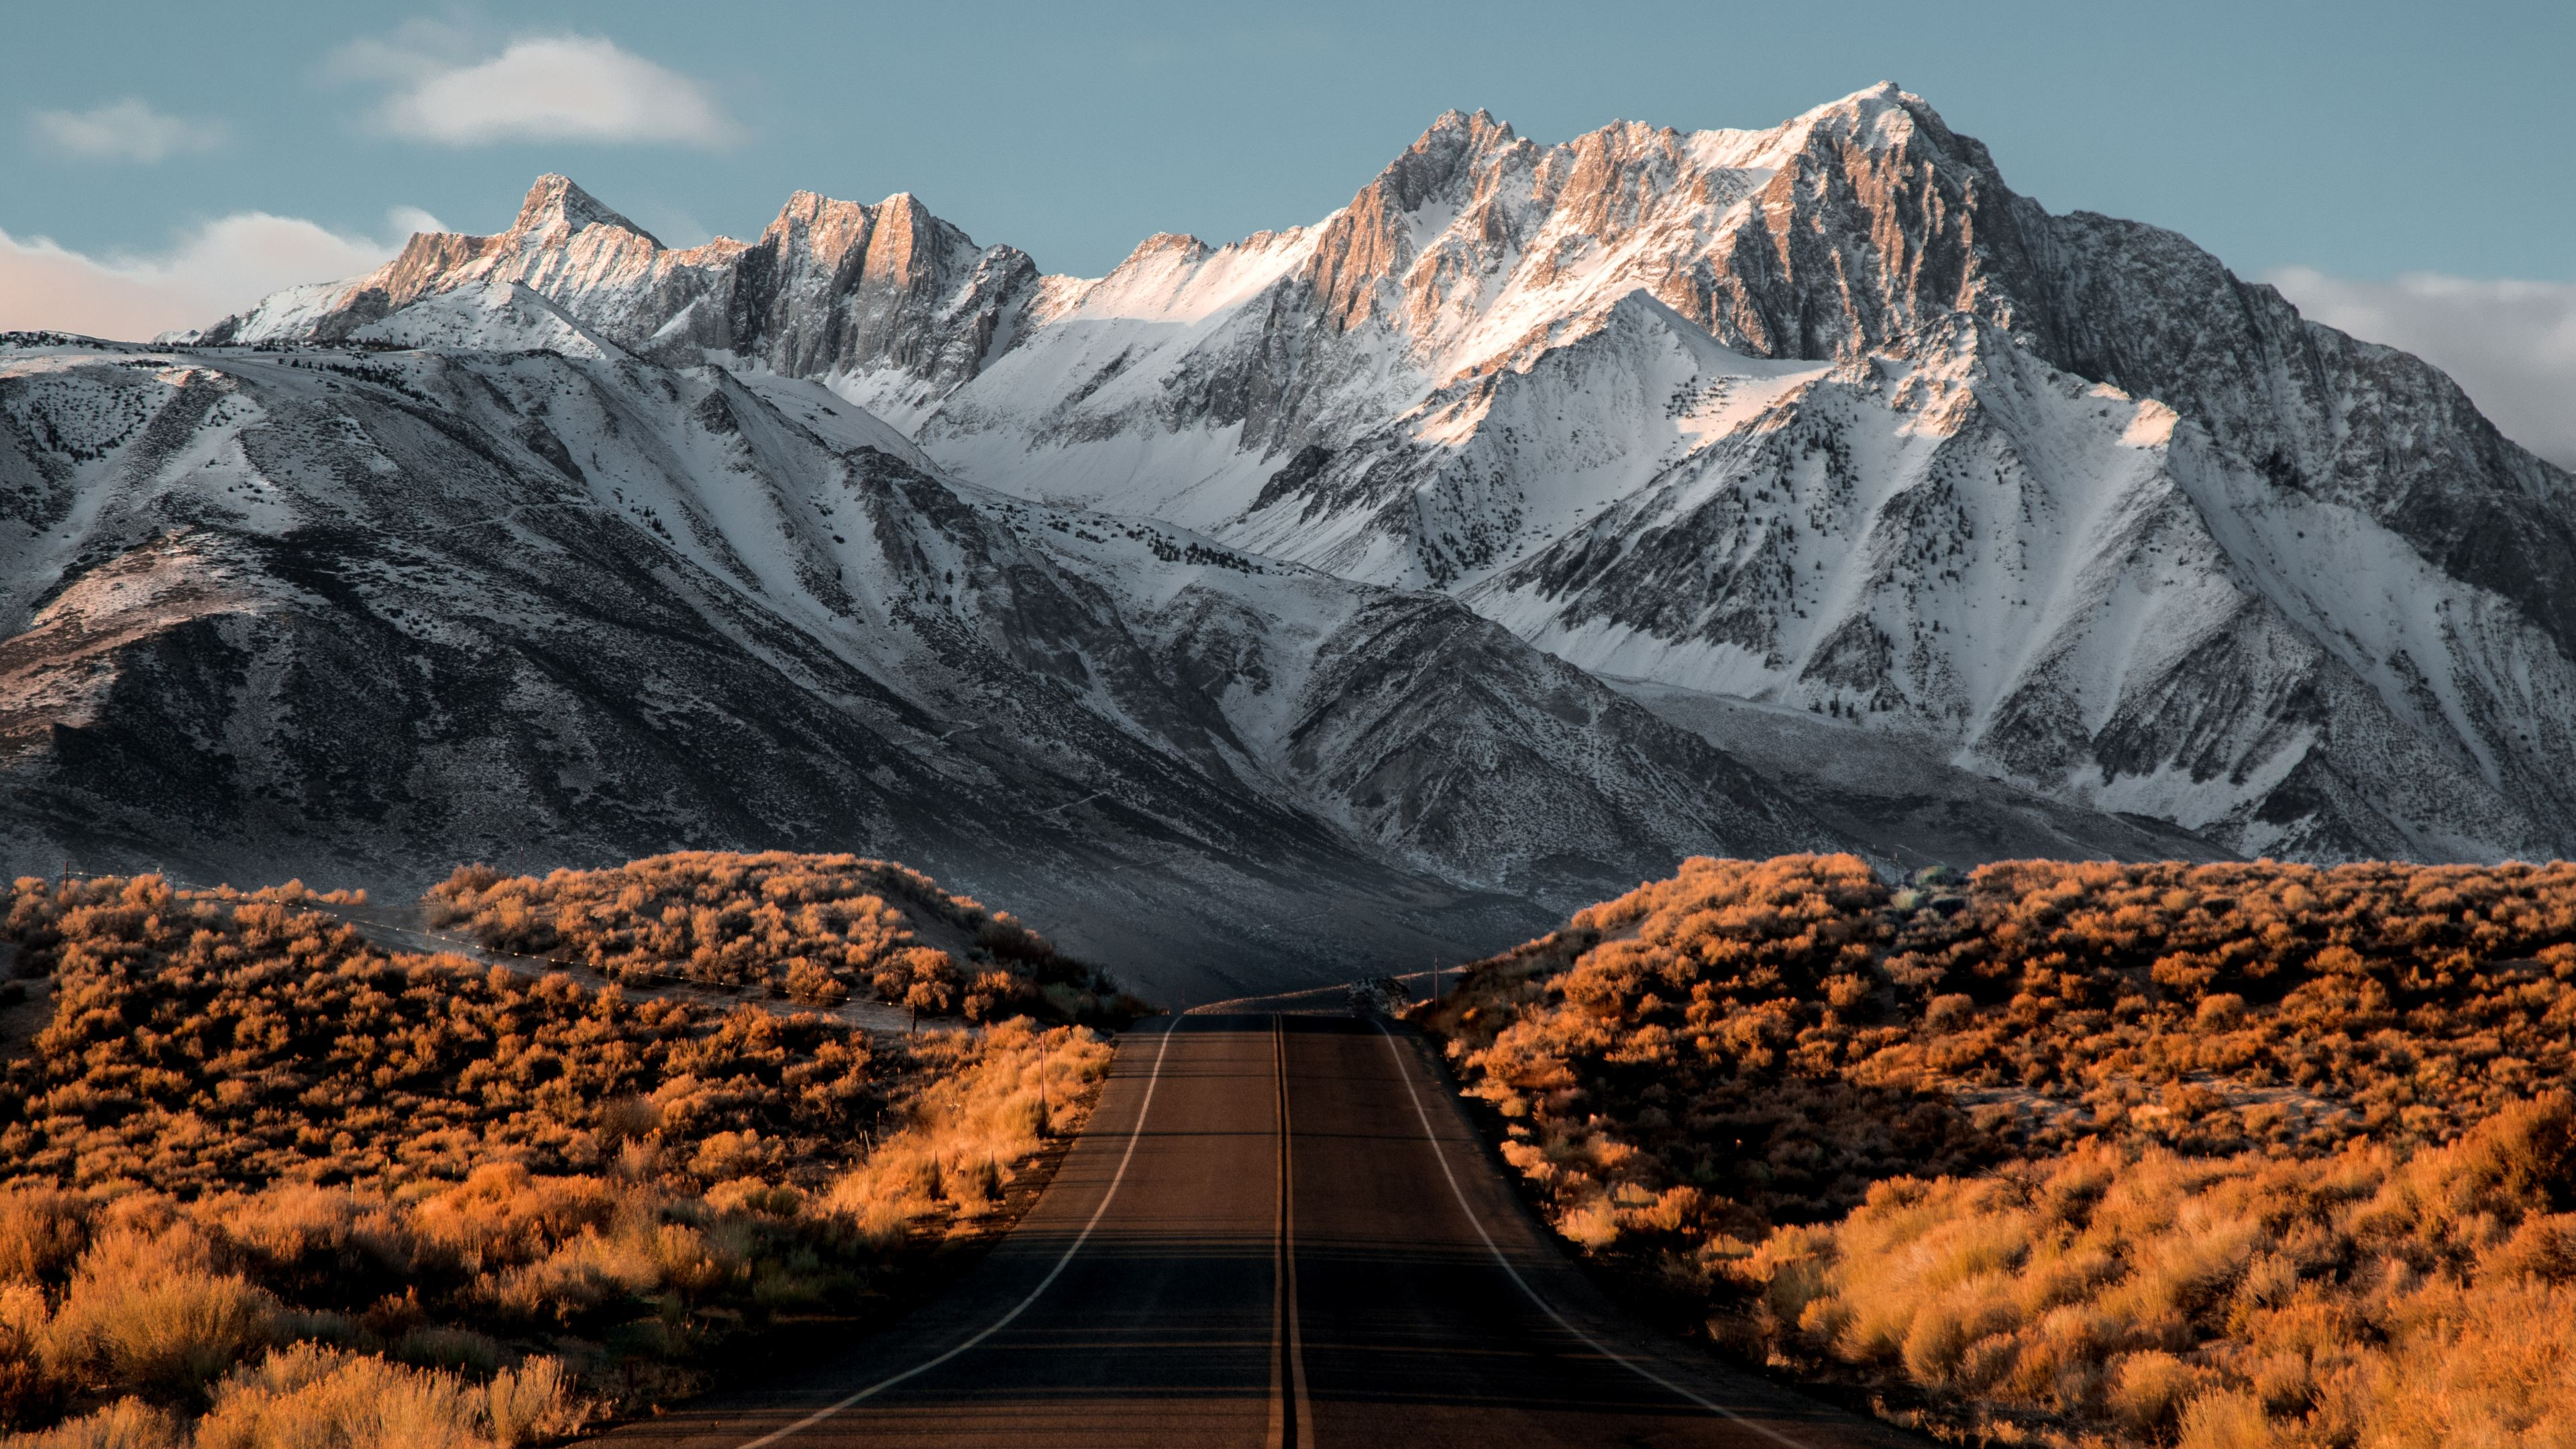 beautiful snowy mountains road 4k 1540140523 - Beautiful Snowy Mountains Road 4k - road wallpapers, photography wallpapers, nature wallpapers, mountains wallpapers, hd-wallpapers, 5k wallpapers, 4k-wallpapers